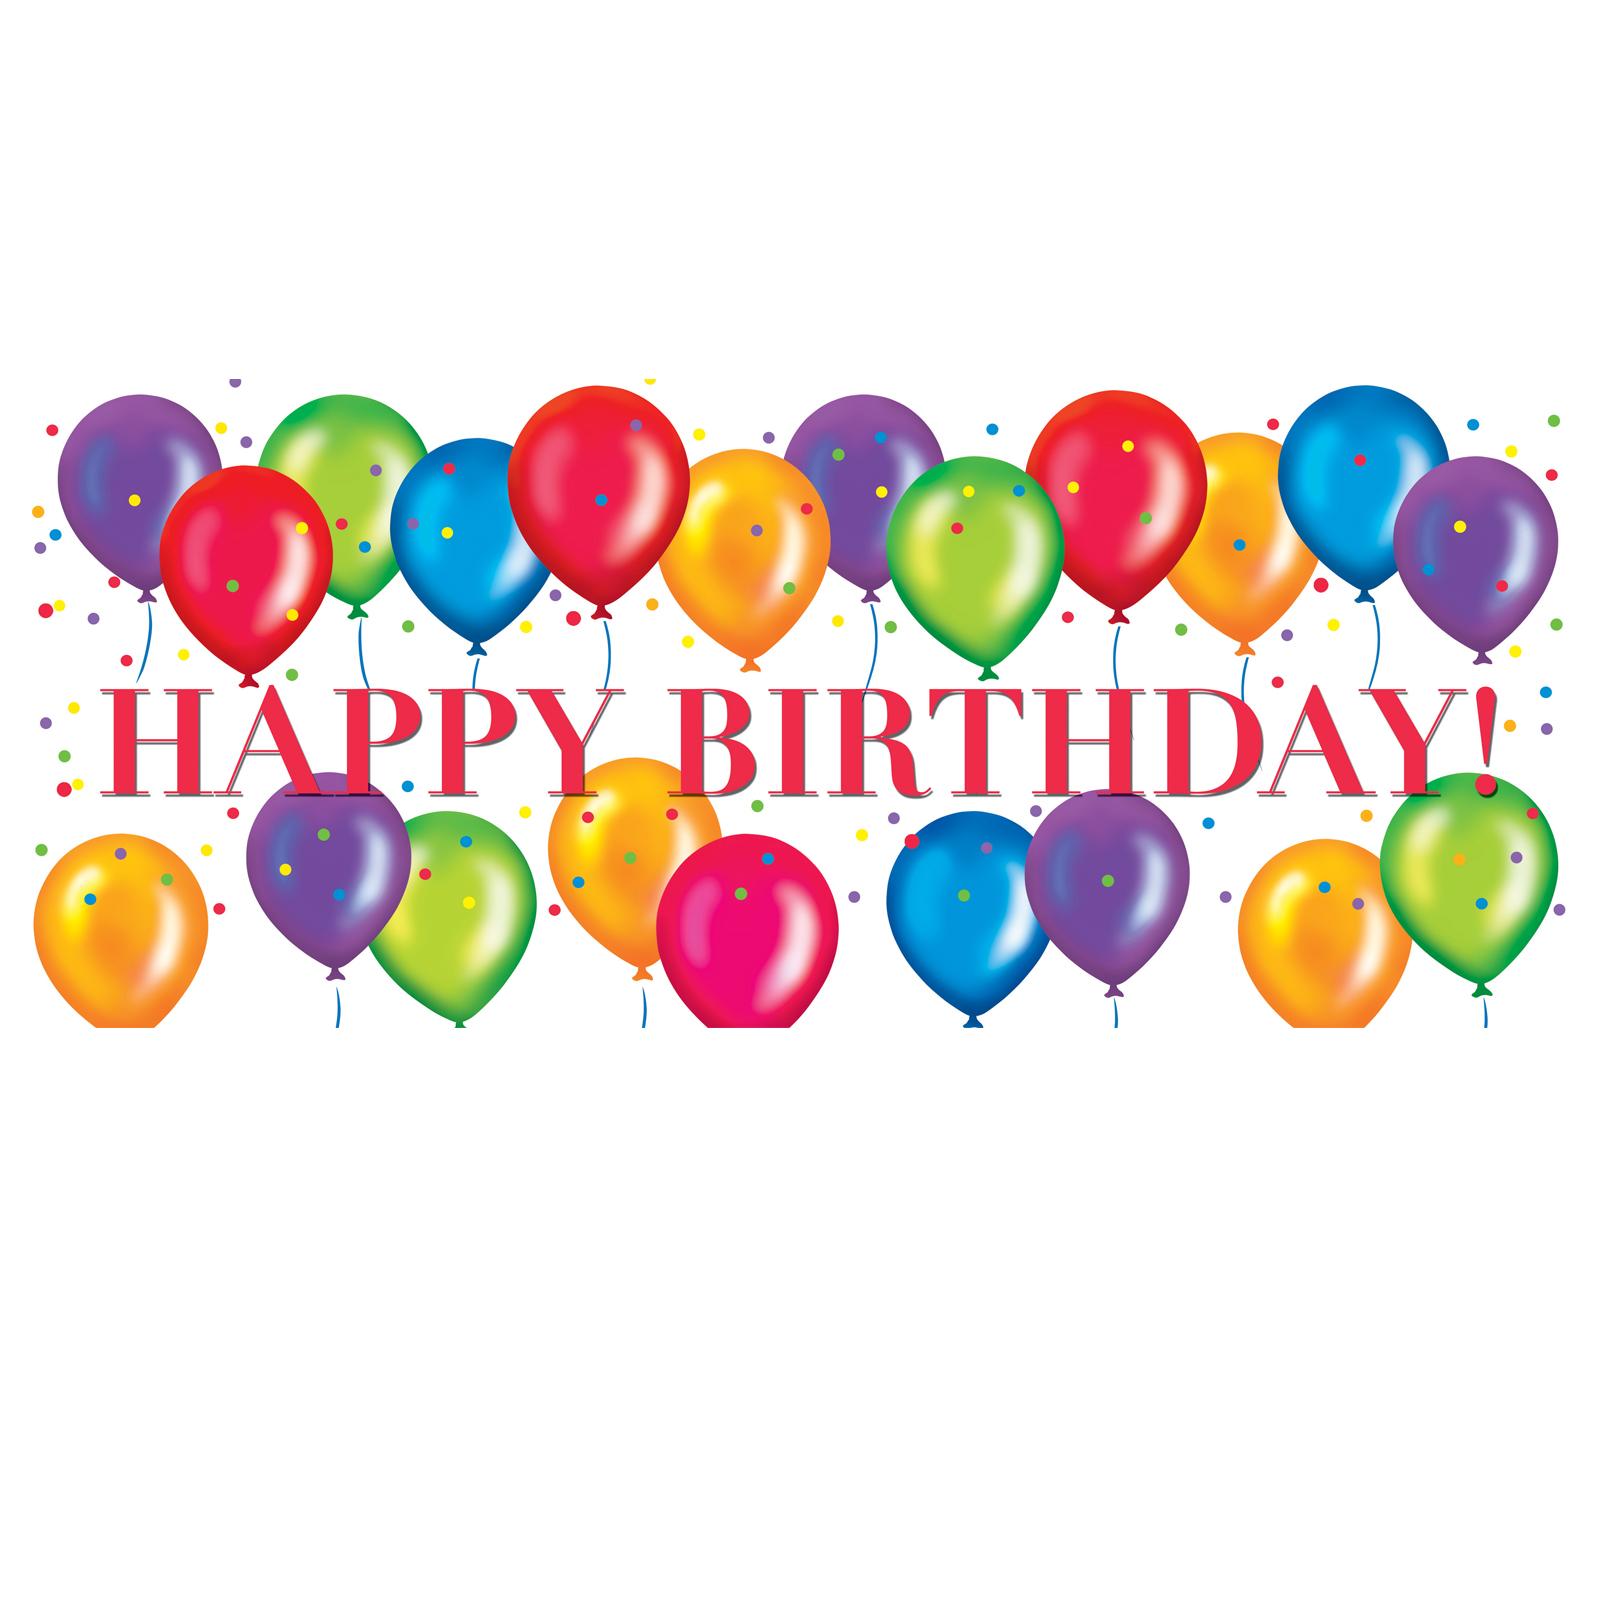 1600x1600 Free Happy Birthday Graphics Birthday Freebies! Happy Birthday